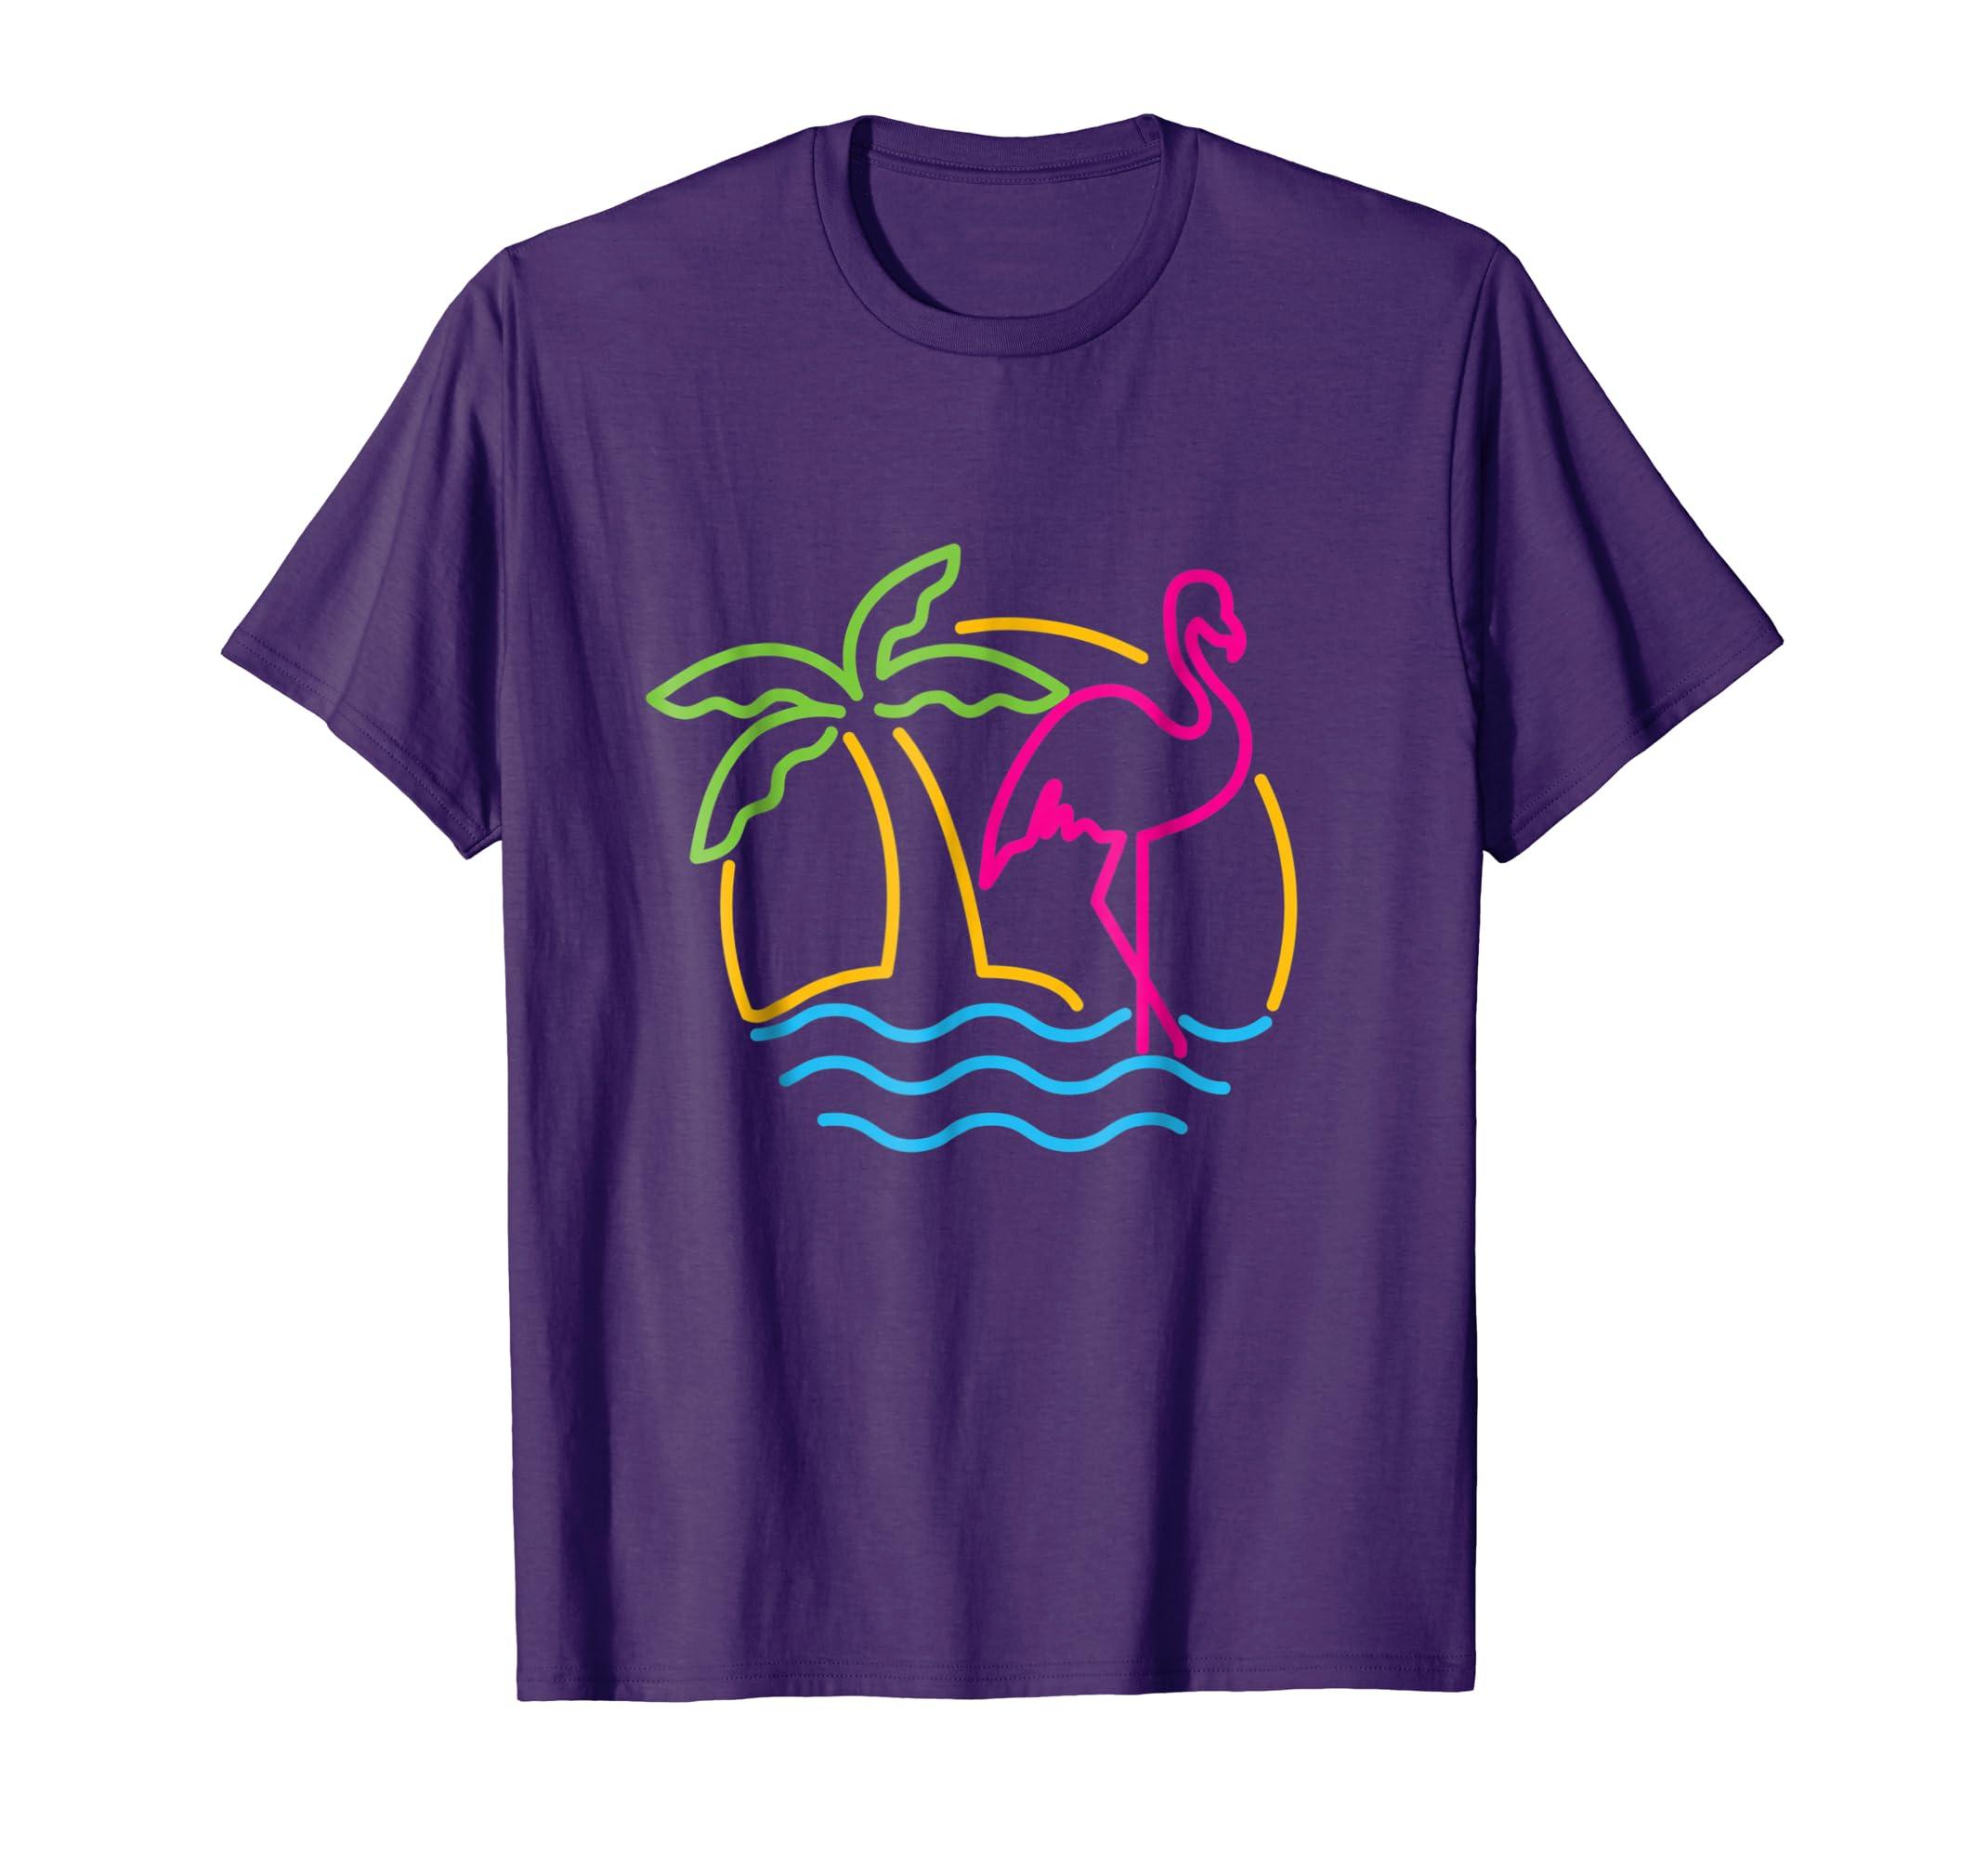 fe654e49 Amazon.com: 80s Vintage Miami Retro Neon Pink Flamingo T-Shirt: Clothing